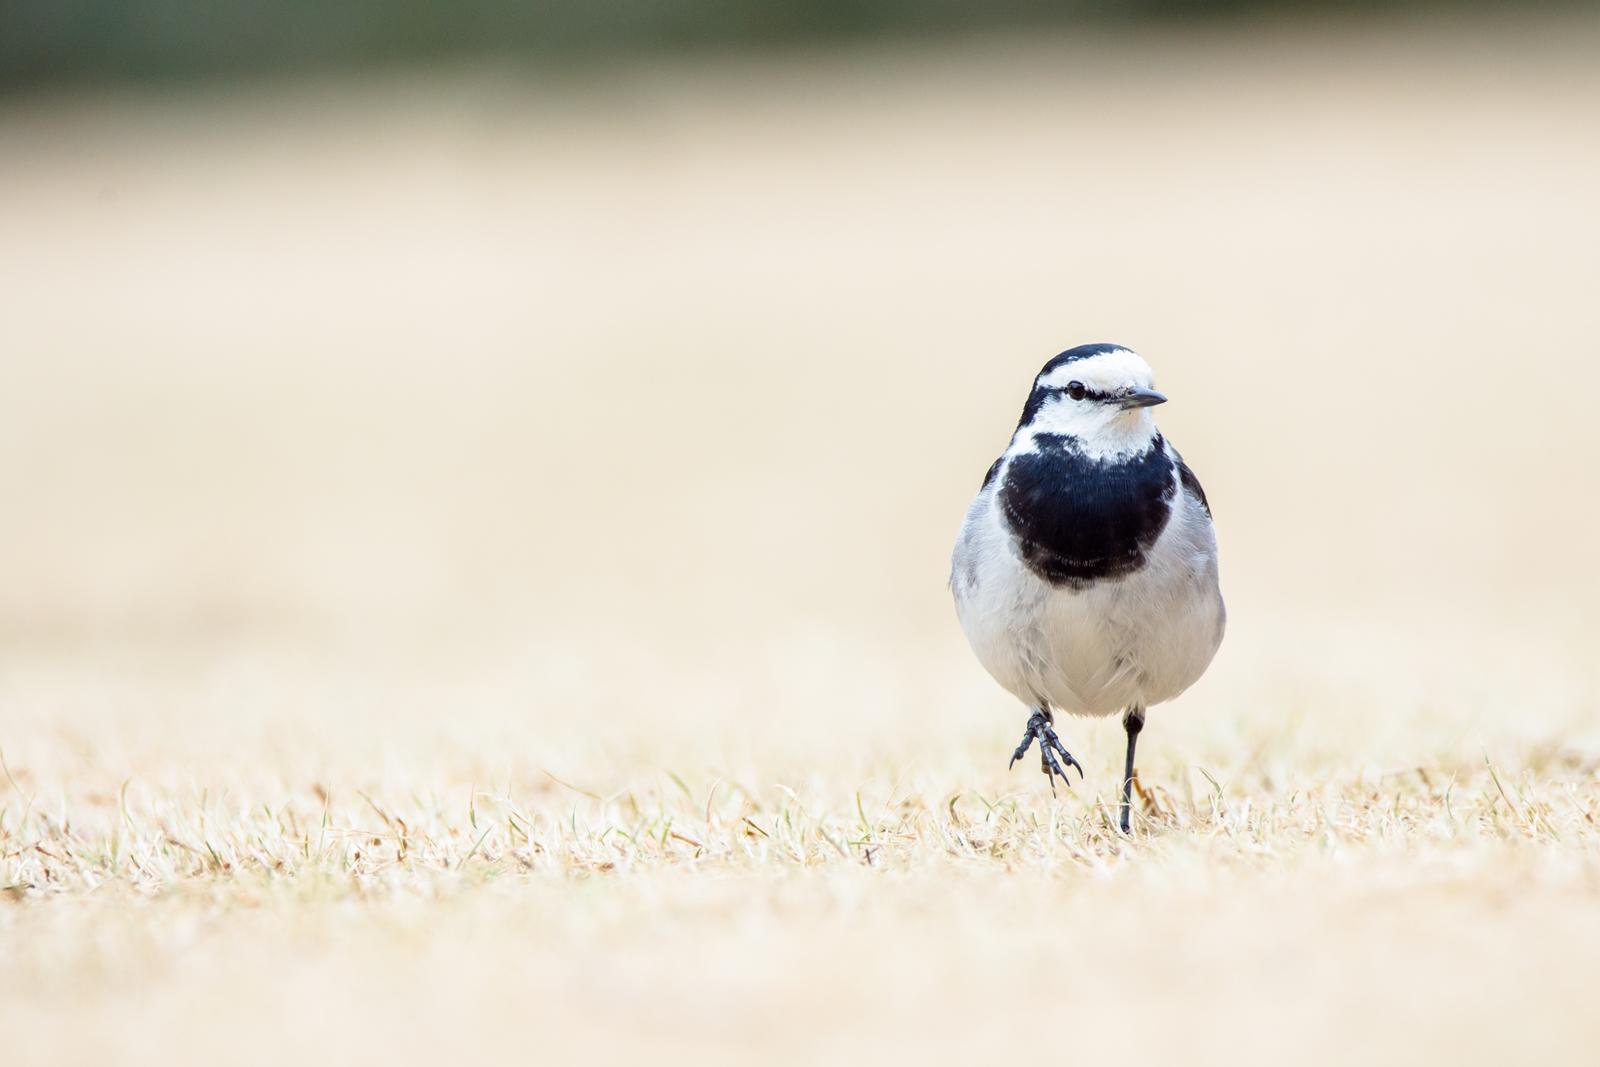 Photo: 「静かな散歩」 / Silent walk.  静かな原っぱ でも感じる 足元から少しずつ 小さな小さな春の声  White Wagtail. (ハクセキレイ)  Nikon D7200 SIGMA 150-600mm F5-6.3 DG OS HSM Contemporary  #birdphotography #birds #kawaii #nikon #sigma #小鳥グラファー  ( http://takafumiooshio.com/archives/747 )